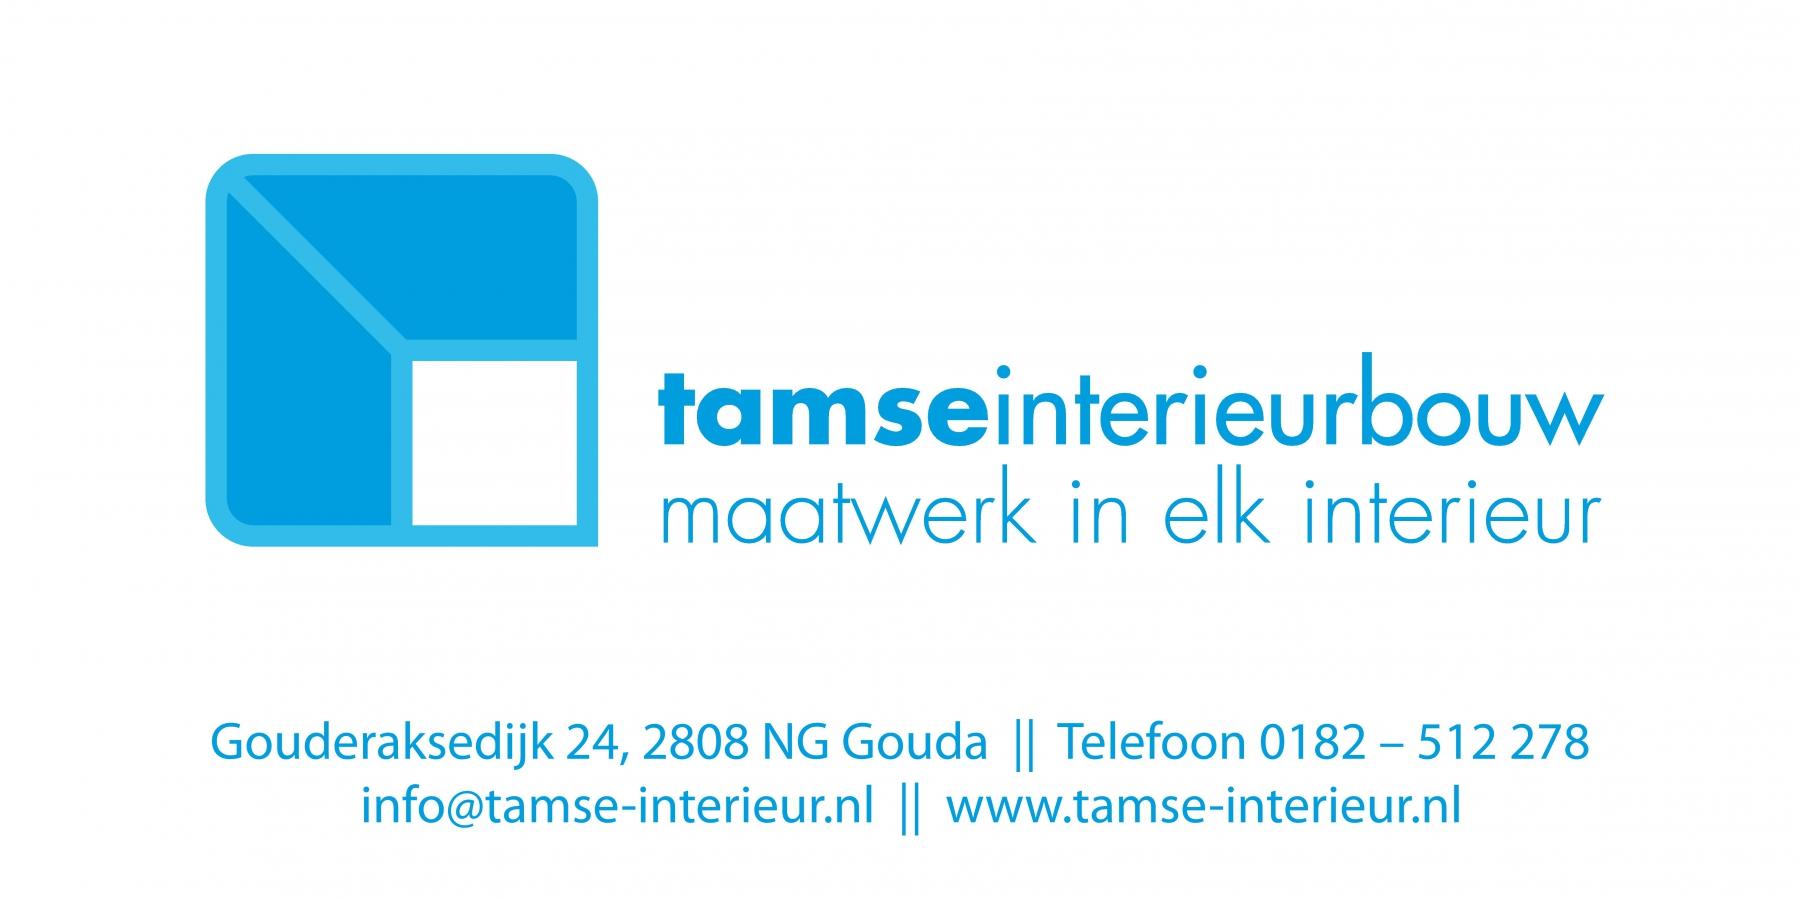 Tamse-Interieurbouw